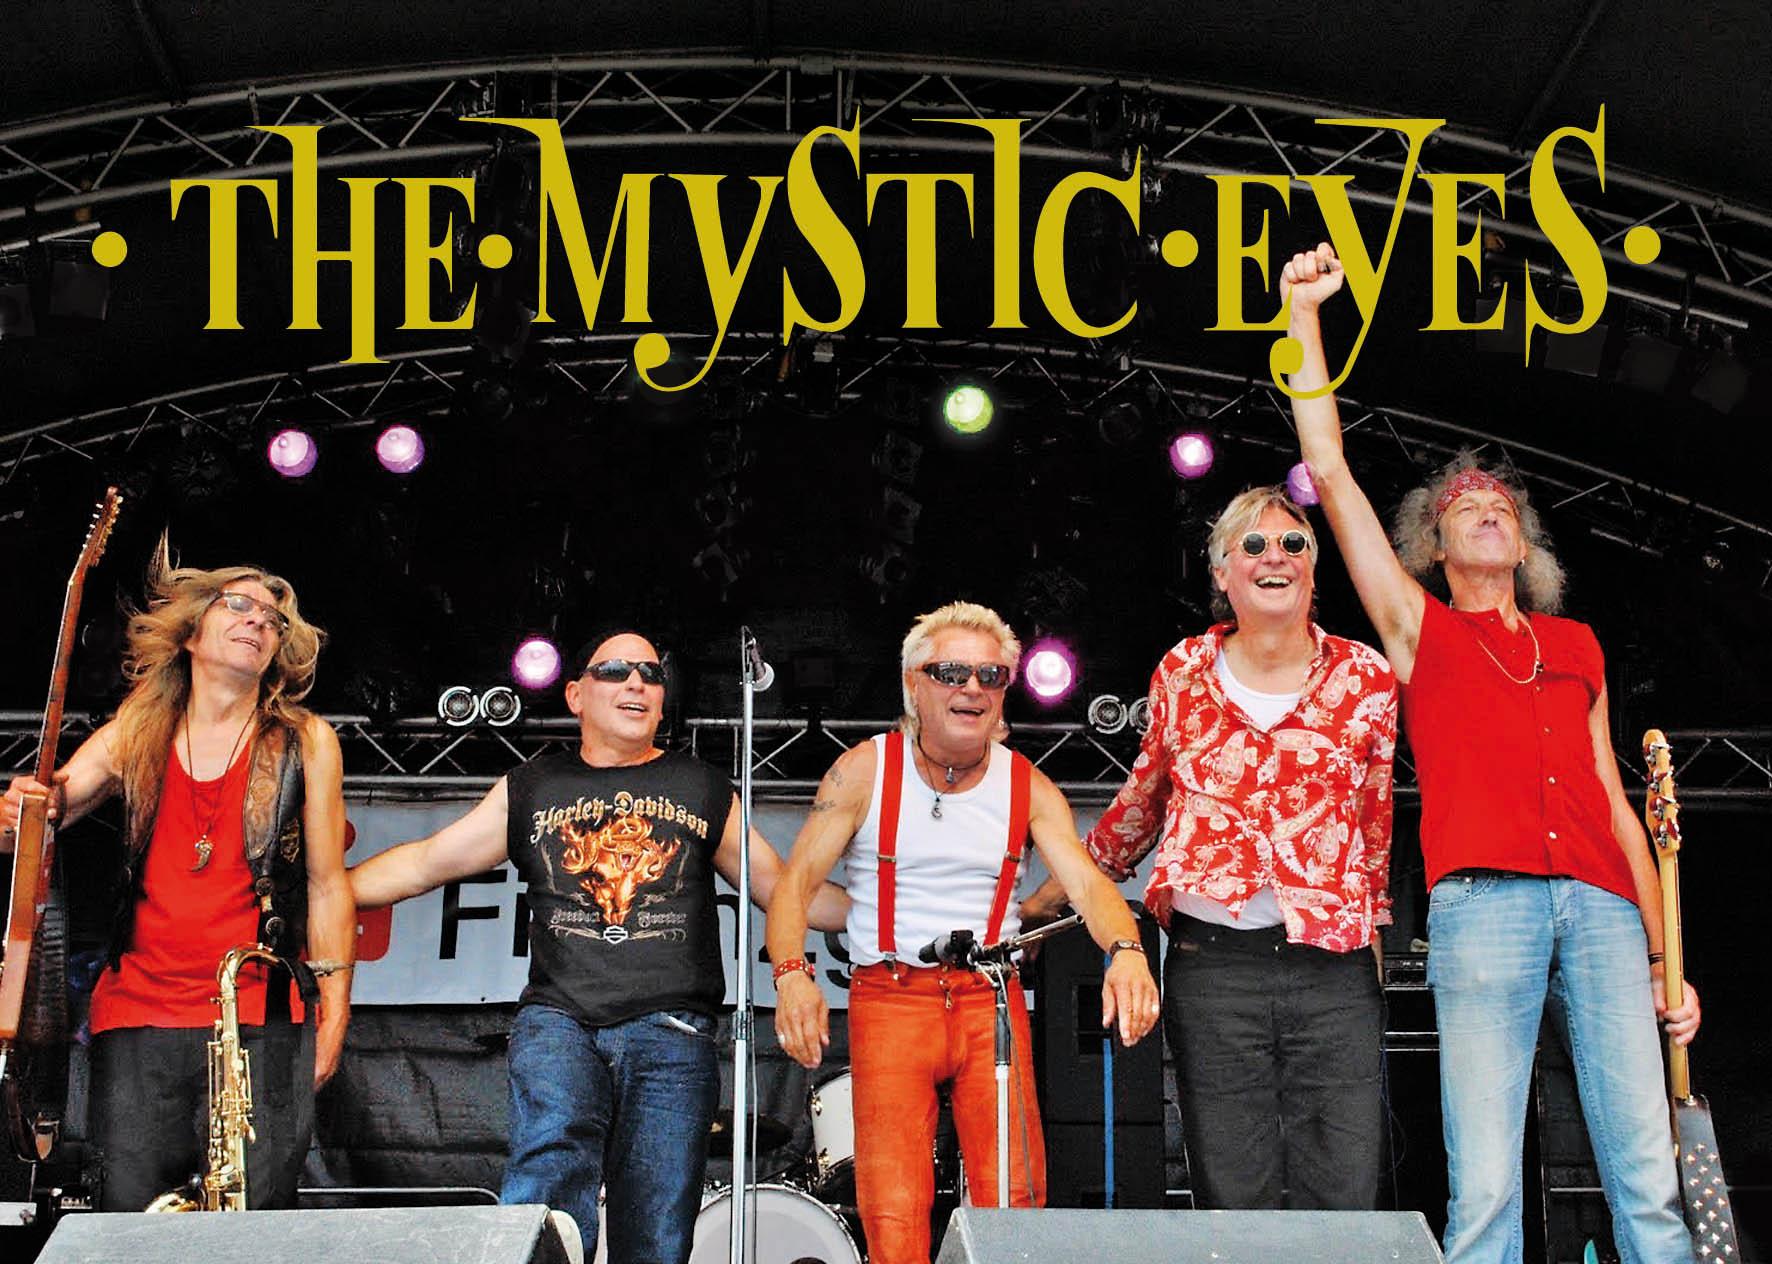 The Mystic Eyes 2011